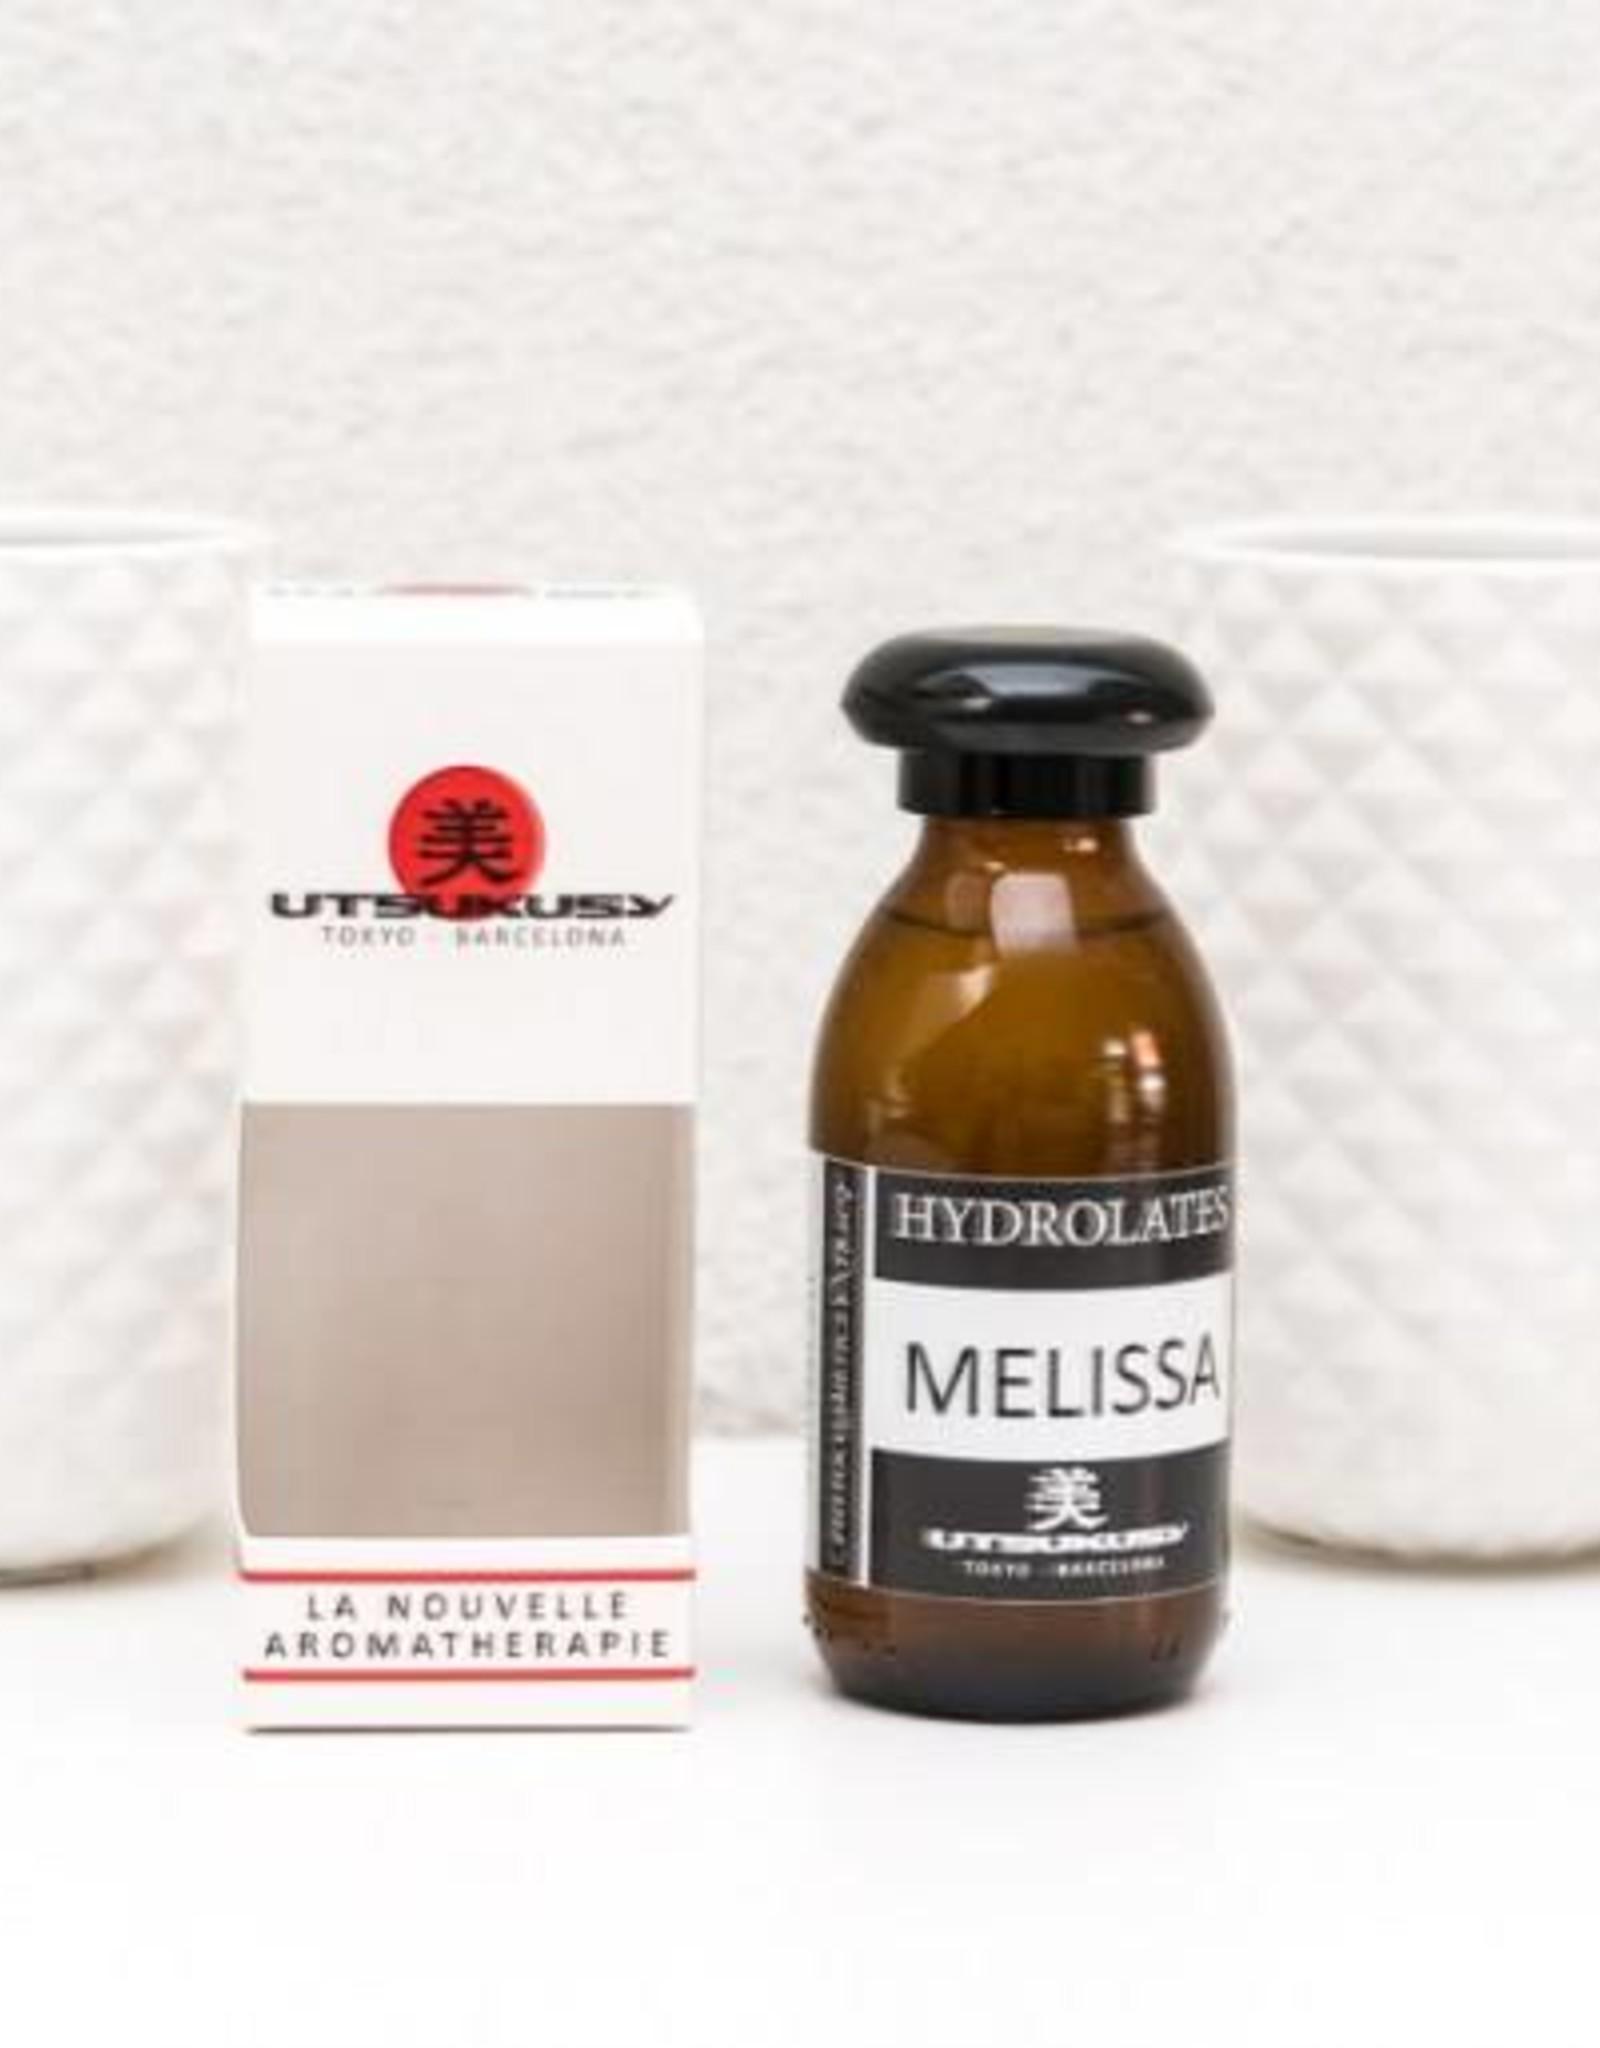 Utsukusy Melisse hydrolaat toner lotion